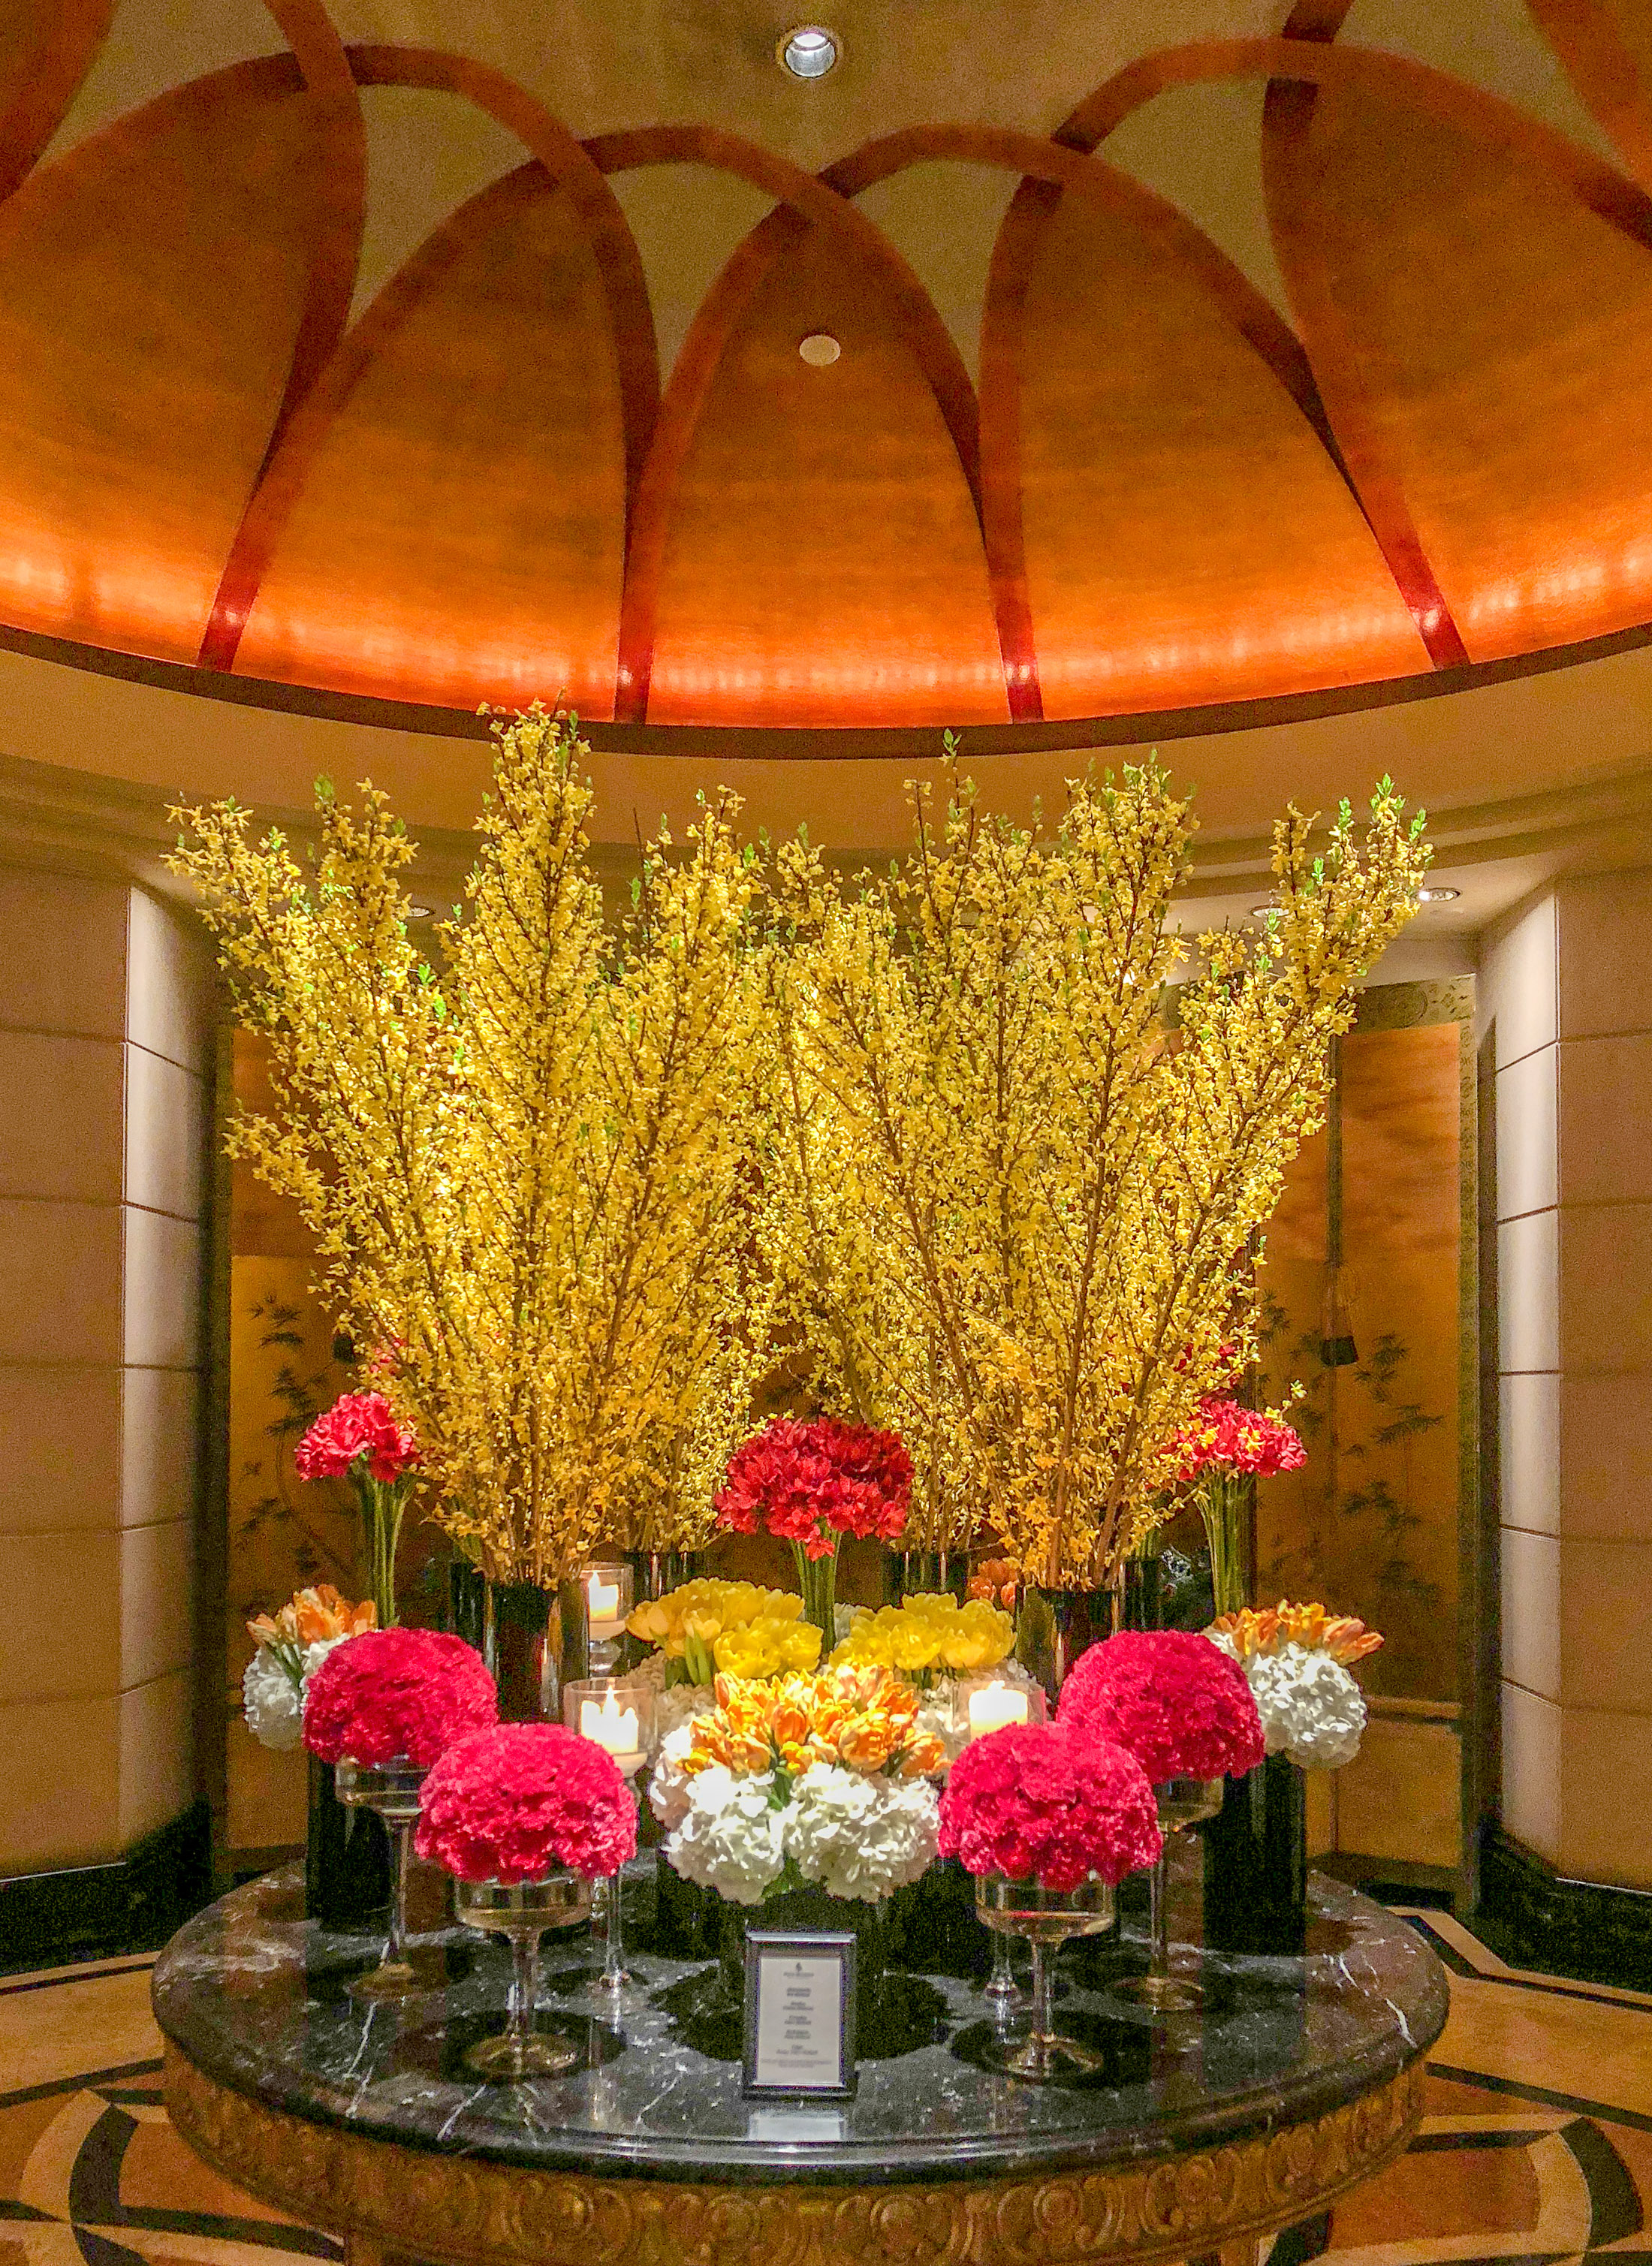 Four Seasons Hotel Singapore flowers